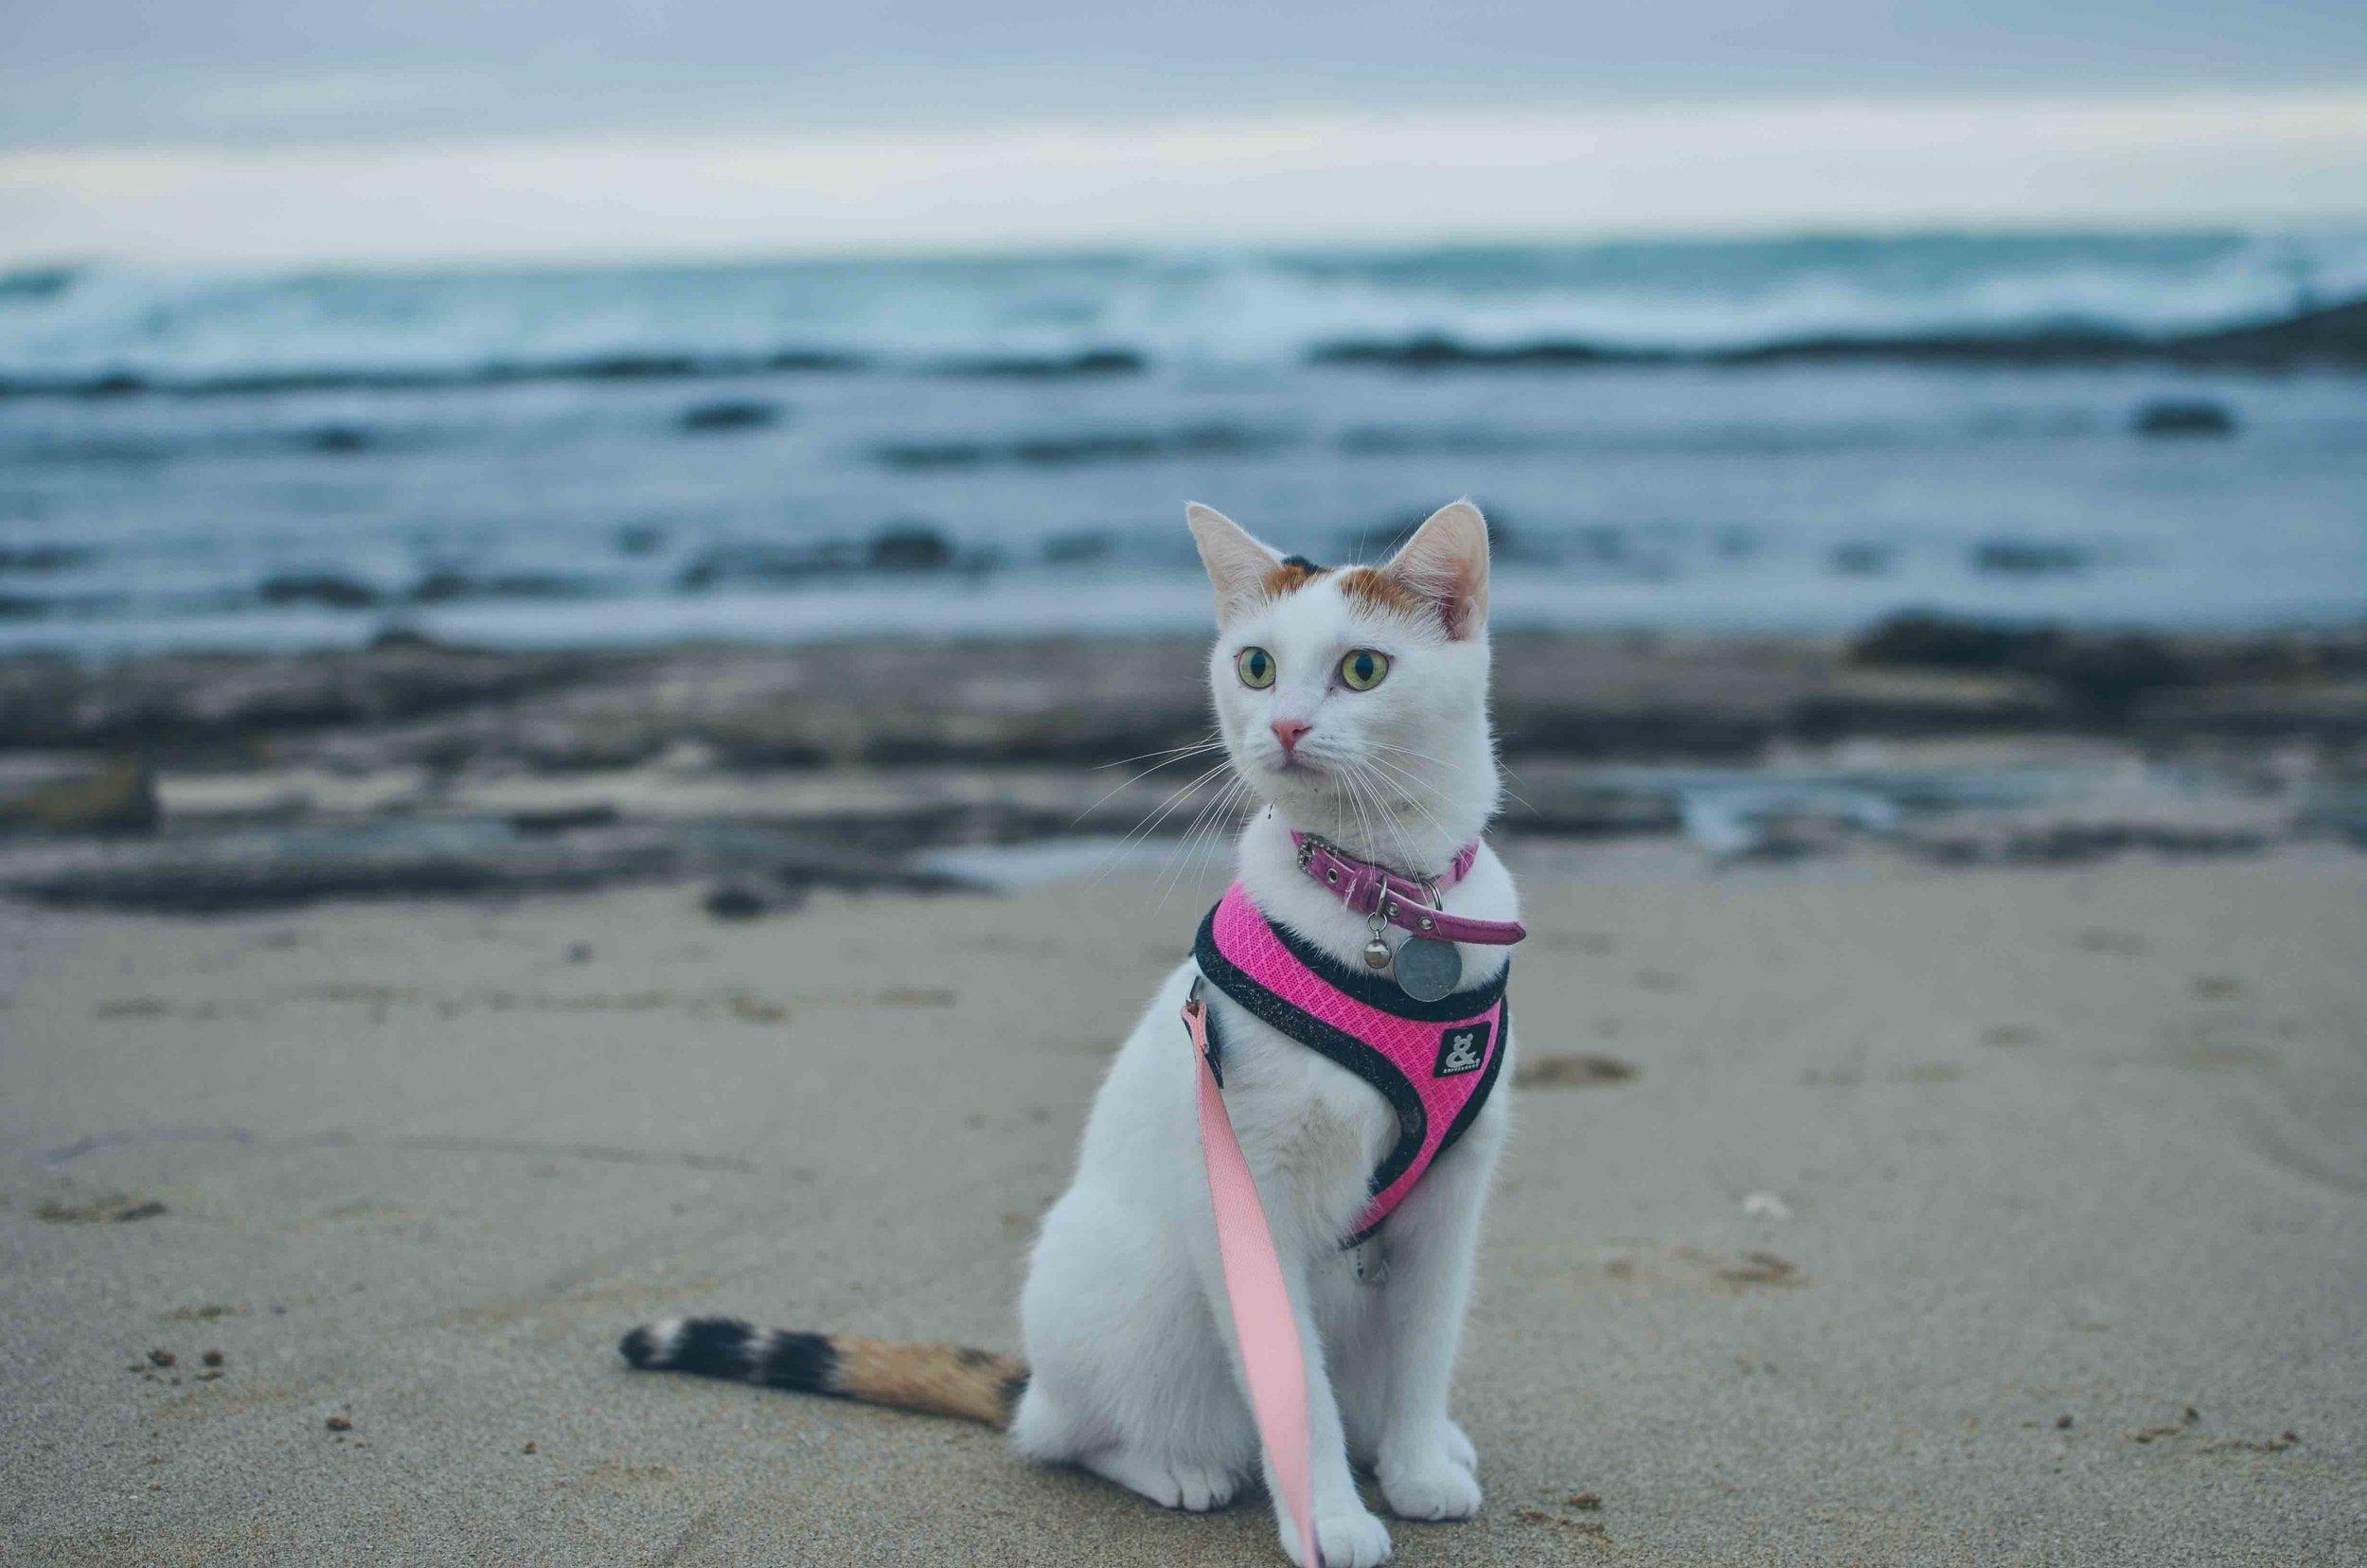 Noxie the beach kitty